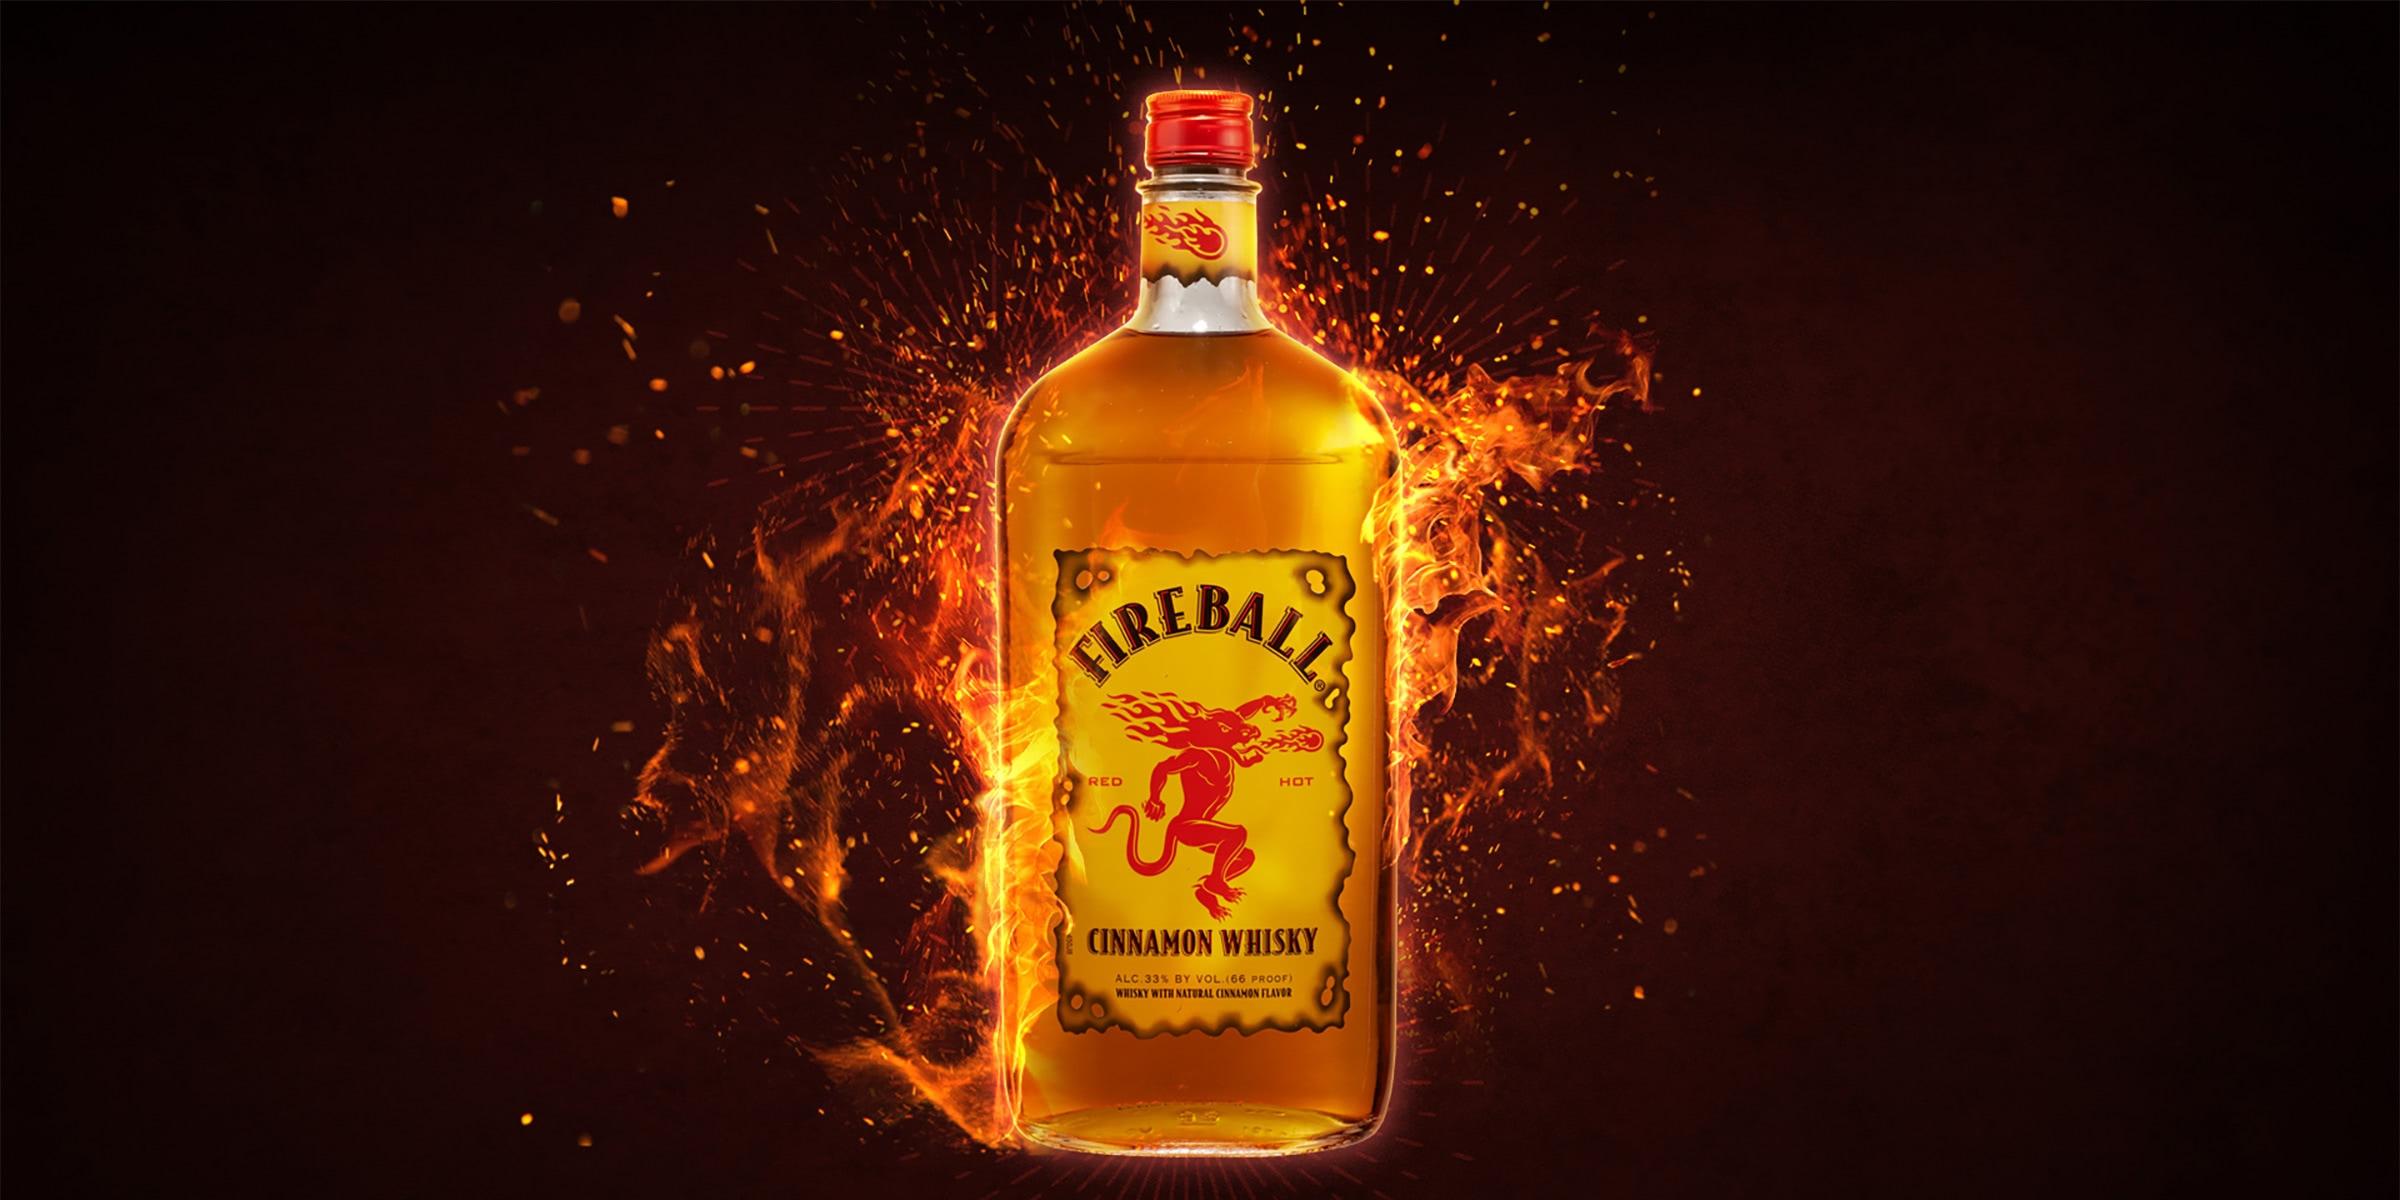 fireball cinnamon whisky - Luxe Digital